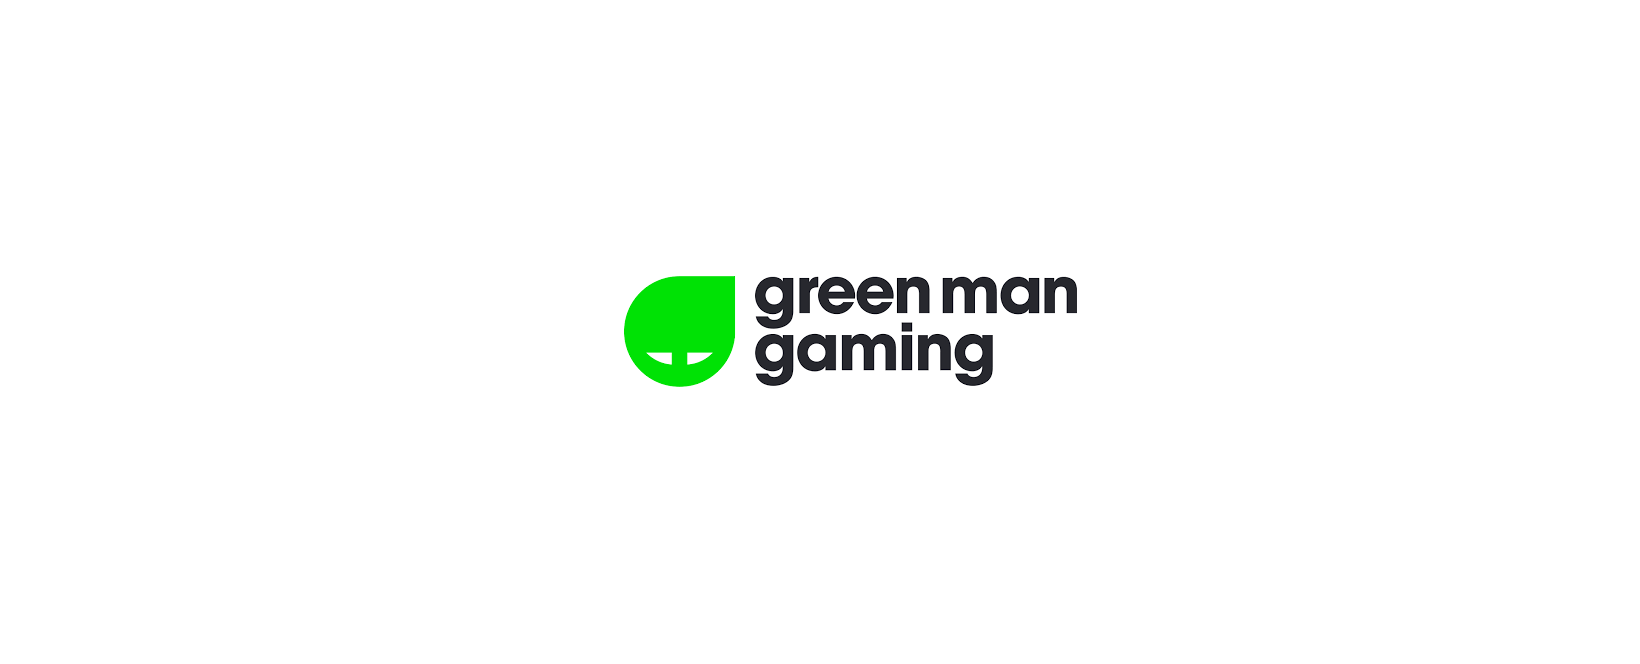 NameGreen Man Gaming Discount Code 2021